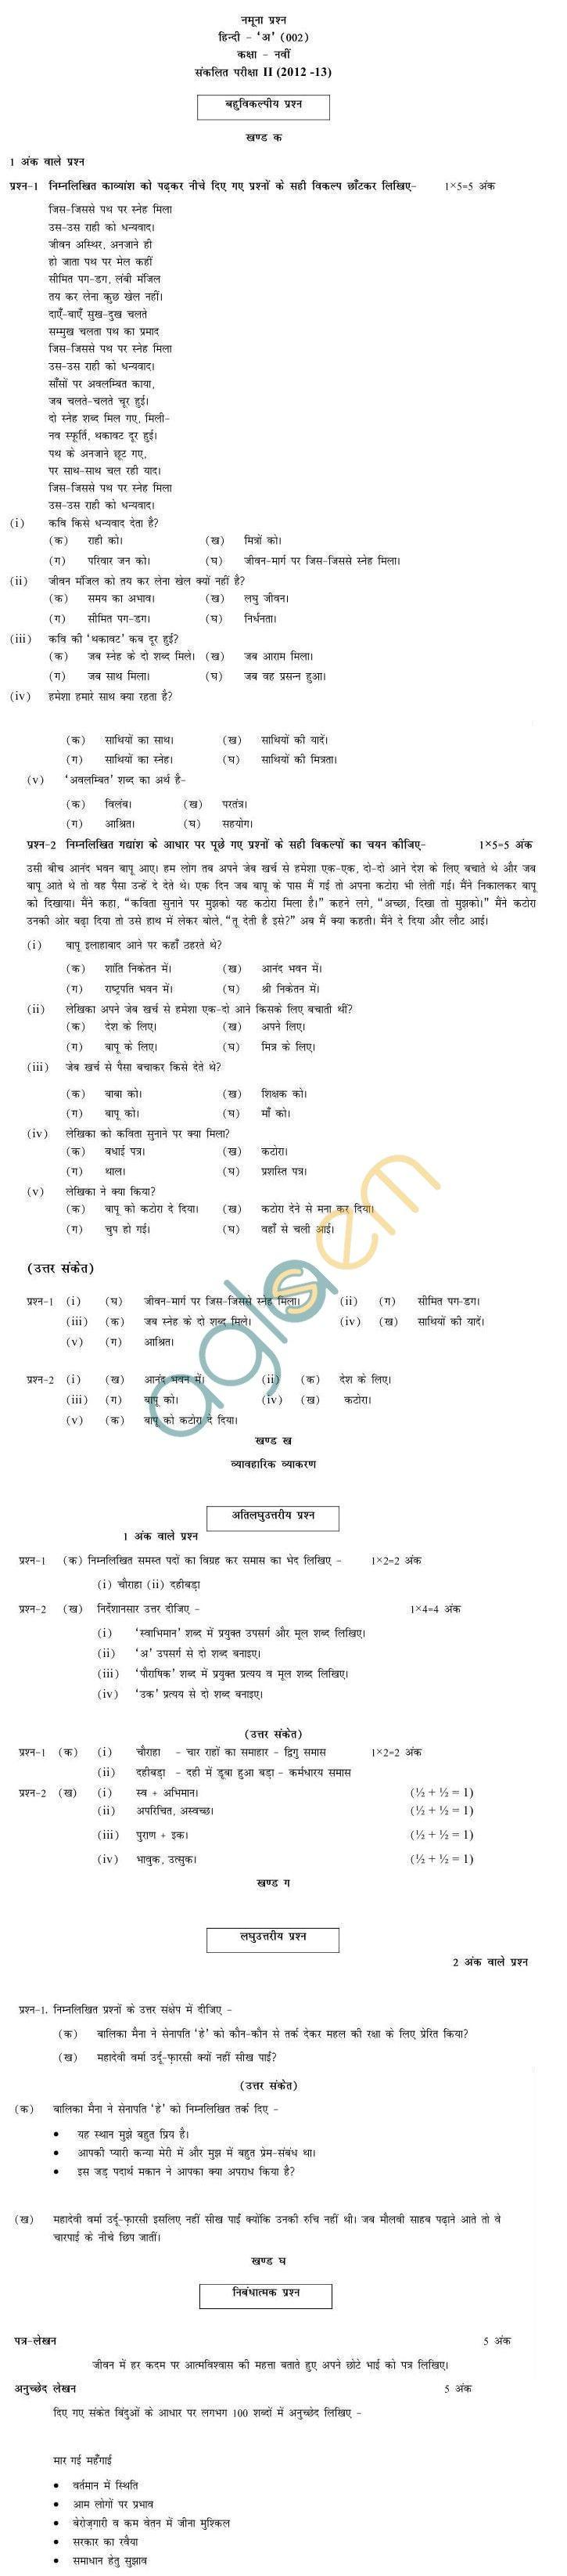 Cbse Board Exam Sample Papers Sa2 Class Ix Hindi A Prathmesh